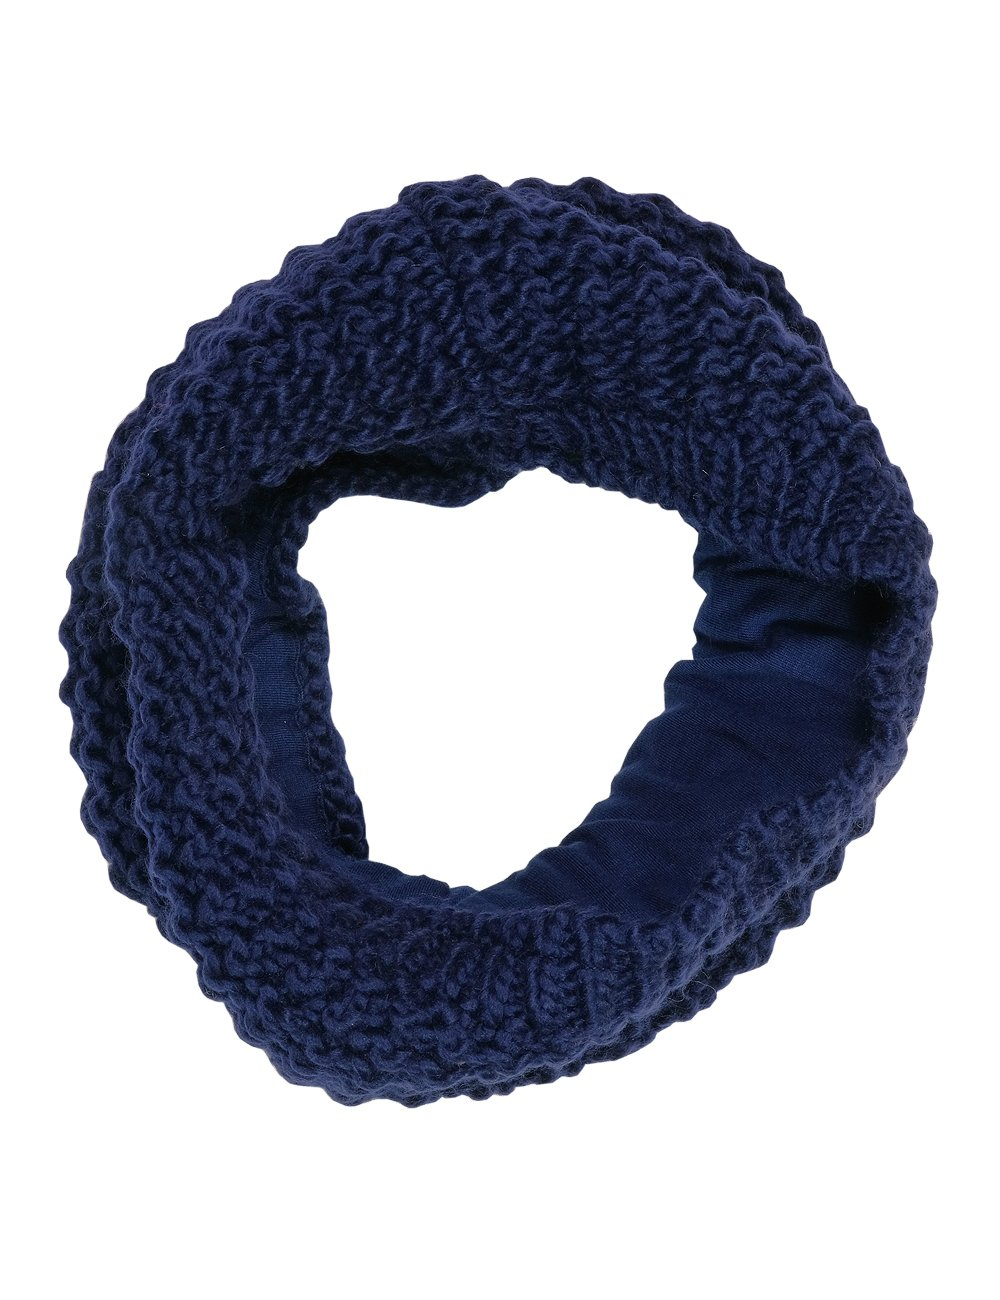 maximo Girl's Tube, Gefüttert Neckerchief maximo Girl' s Tube Blue (Navy 48) One Size 73673-820700_48